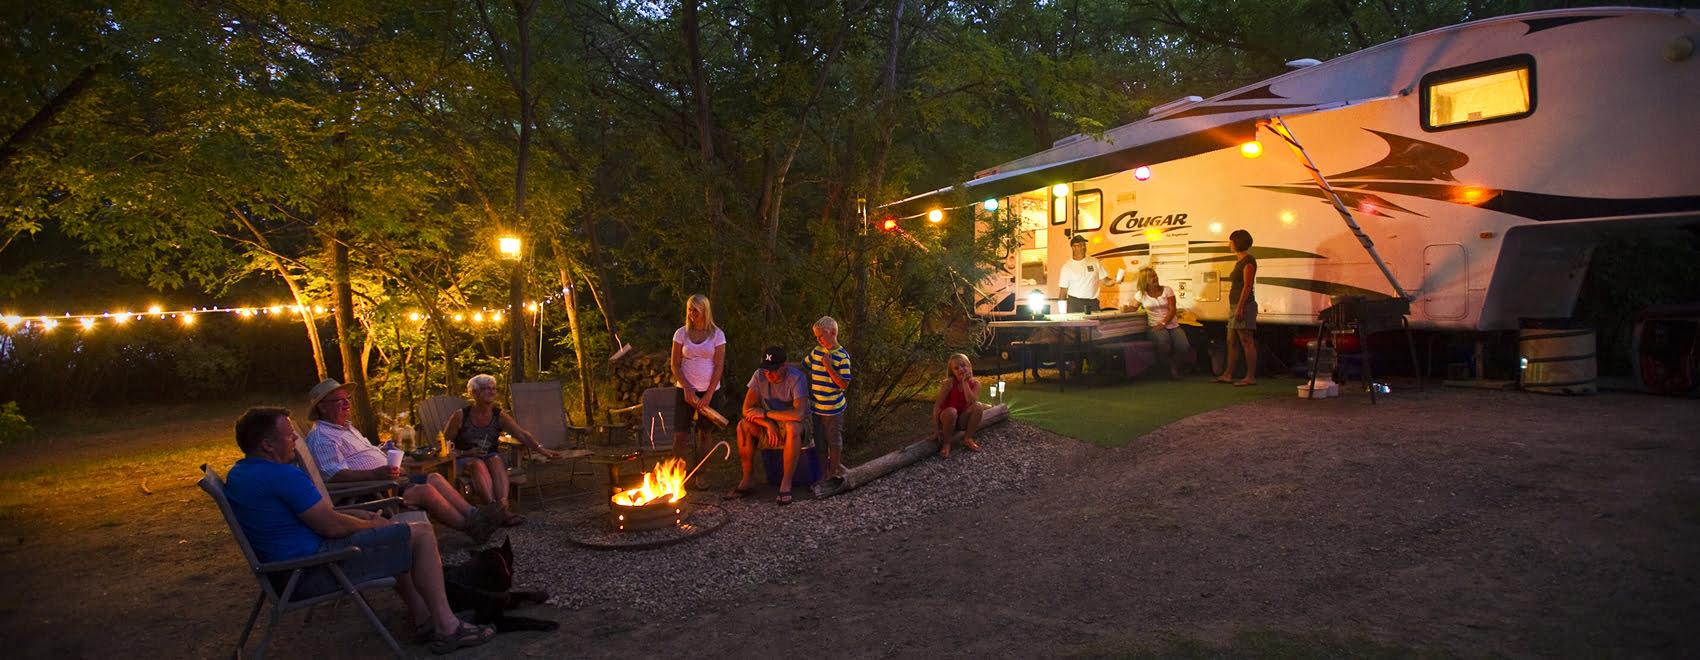 Saskatchewan Landing Provincial Park - Camping - Tourism Saskatchewan Paul Austring